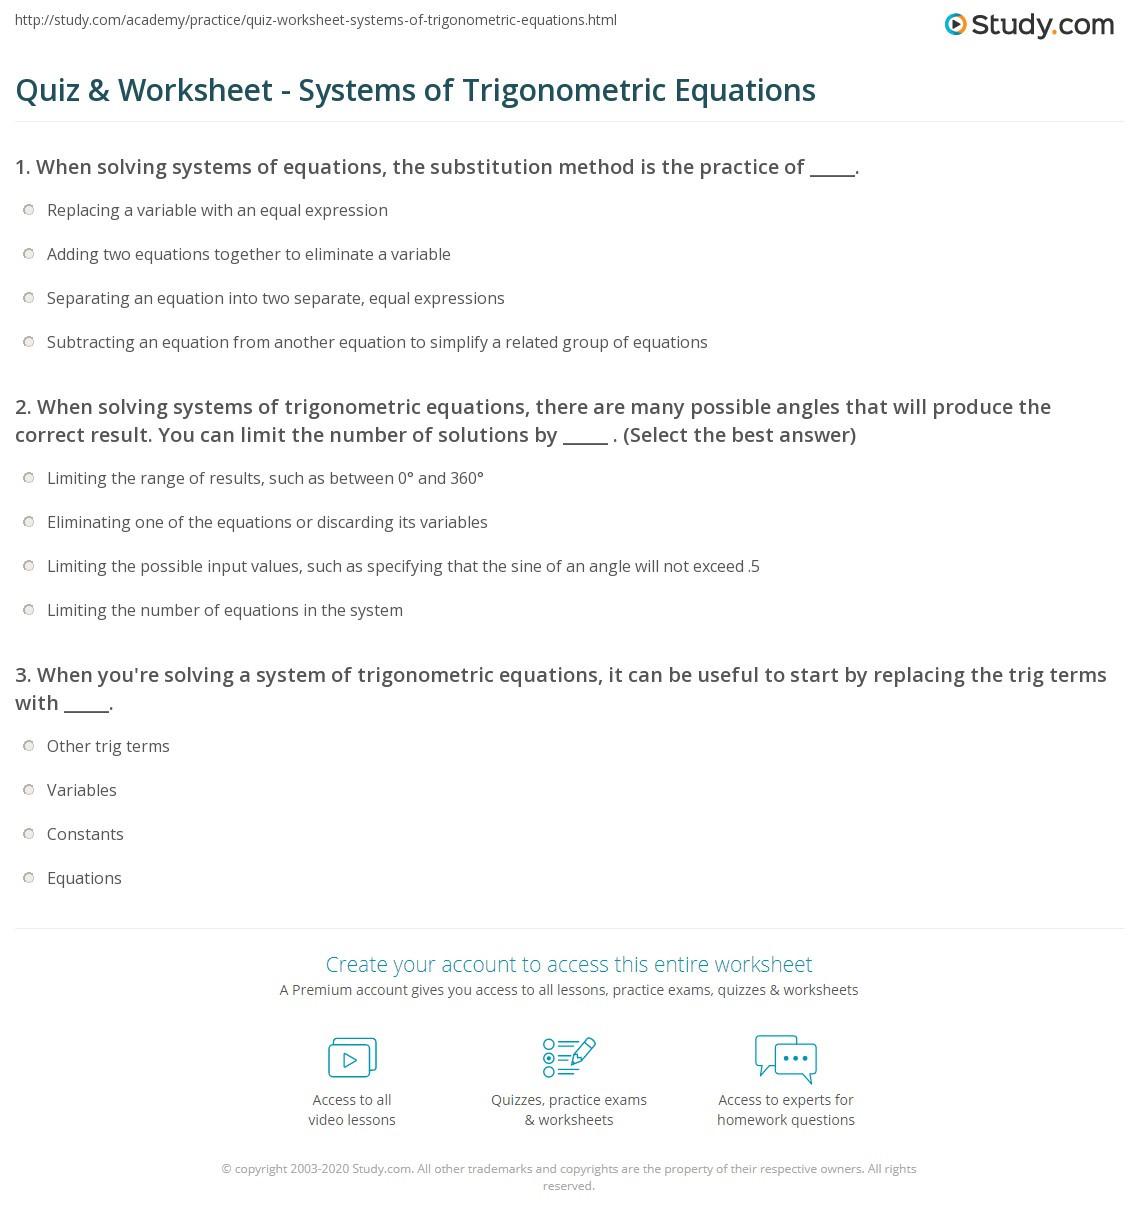 Solve Trig Equations Worksheet Quiz & Worksheet Systems Of Trigonometric Equations